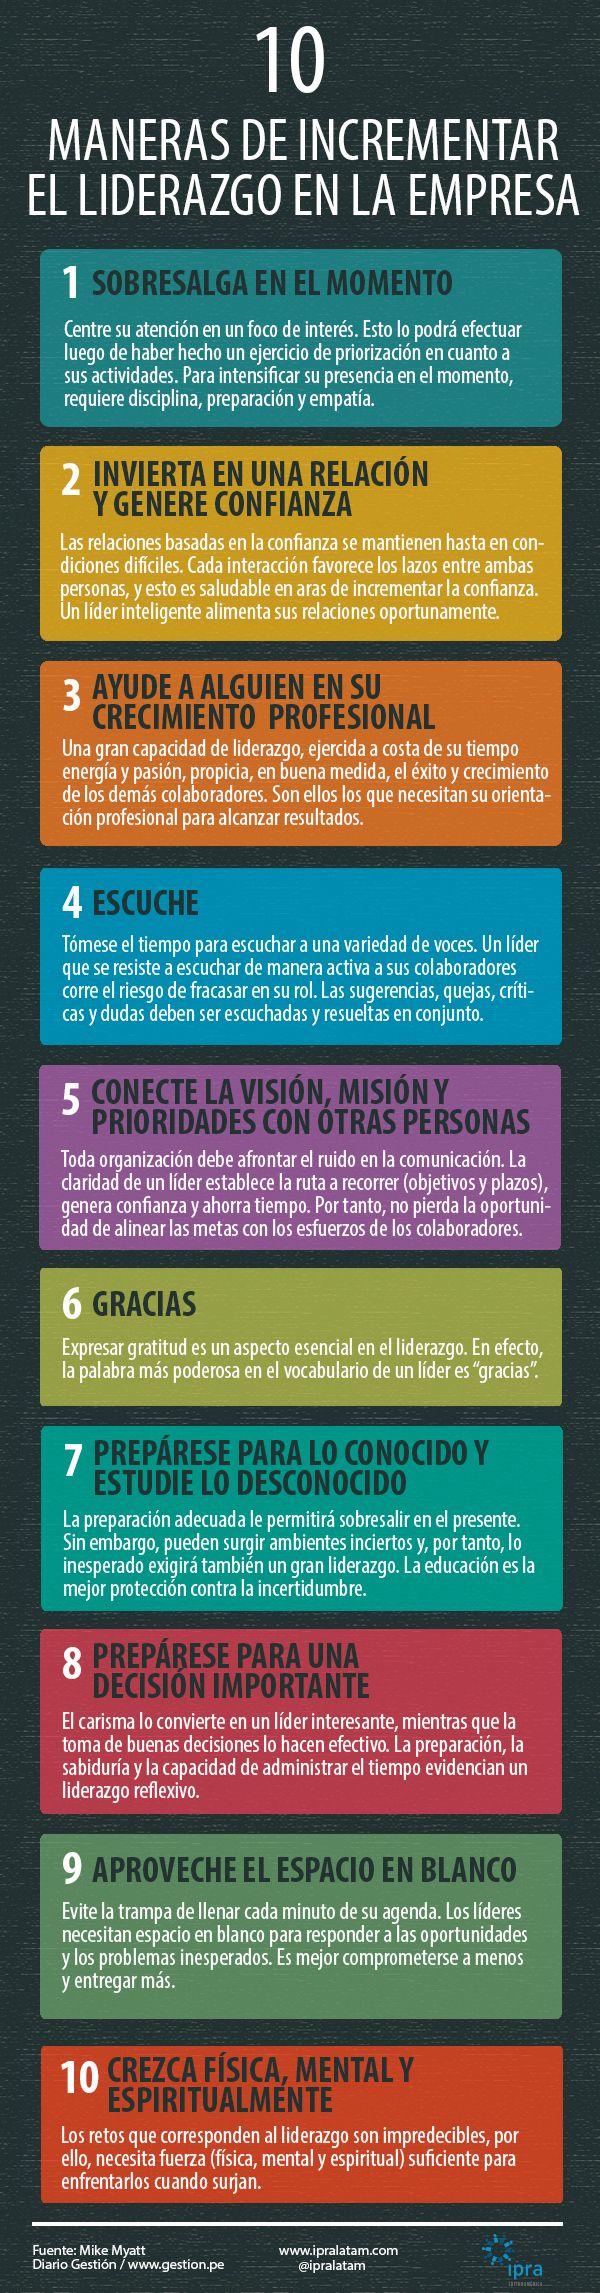 #Infografia 10 maneras de incrementar el #Liderazgo en la empresa #TAVnews